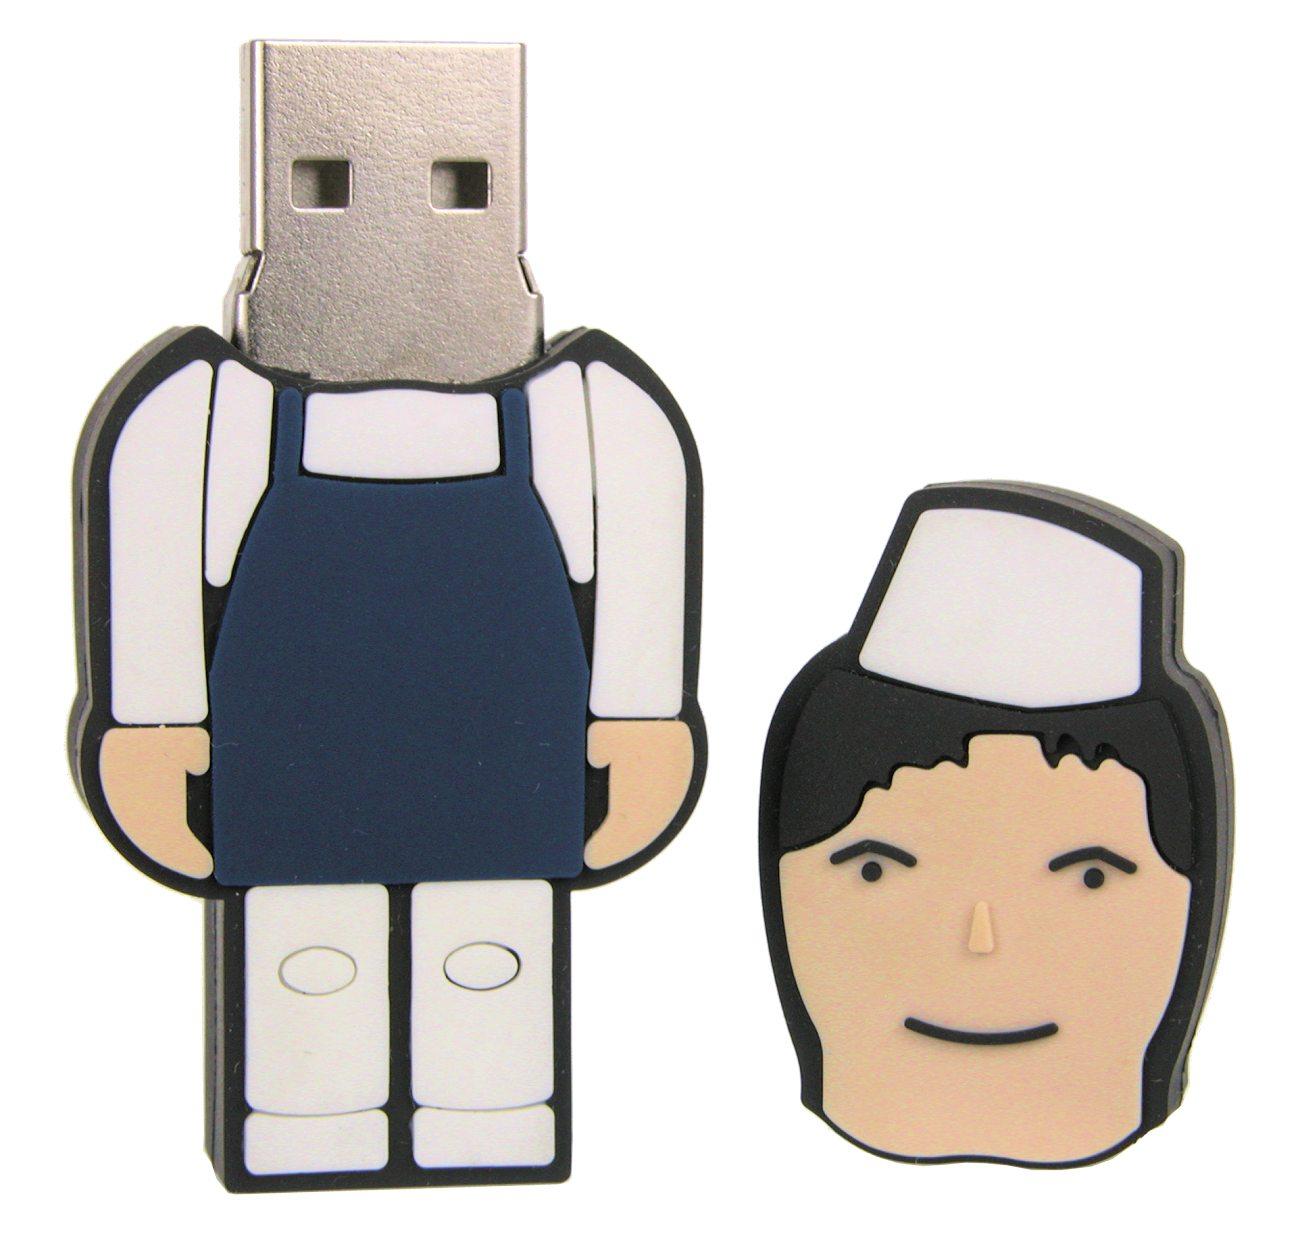 Human Usb Flash Drive Lady Cd219